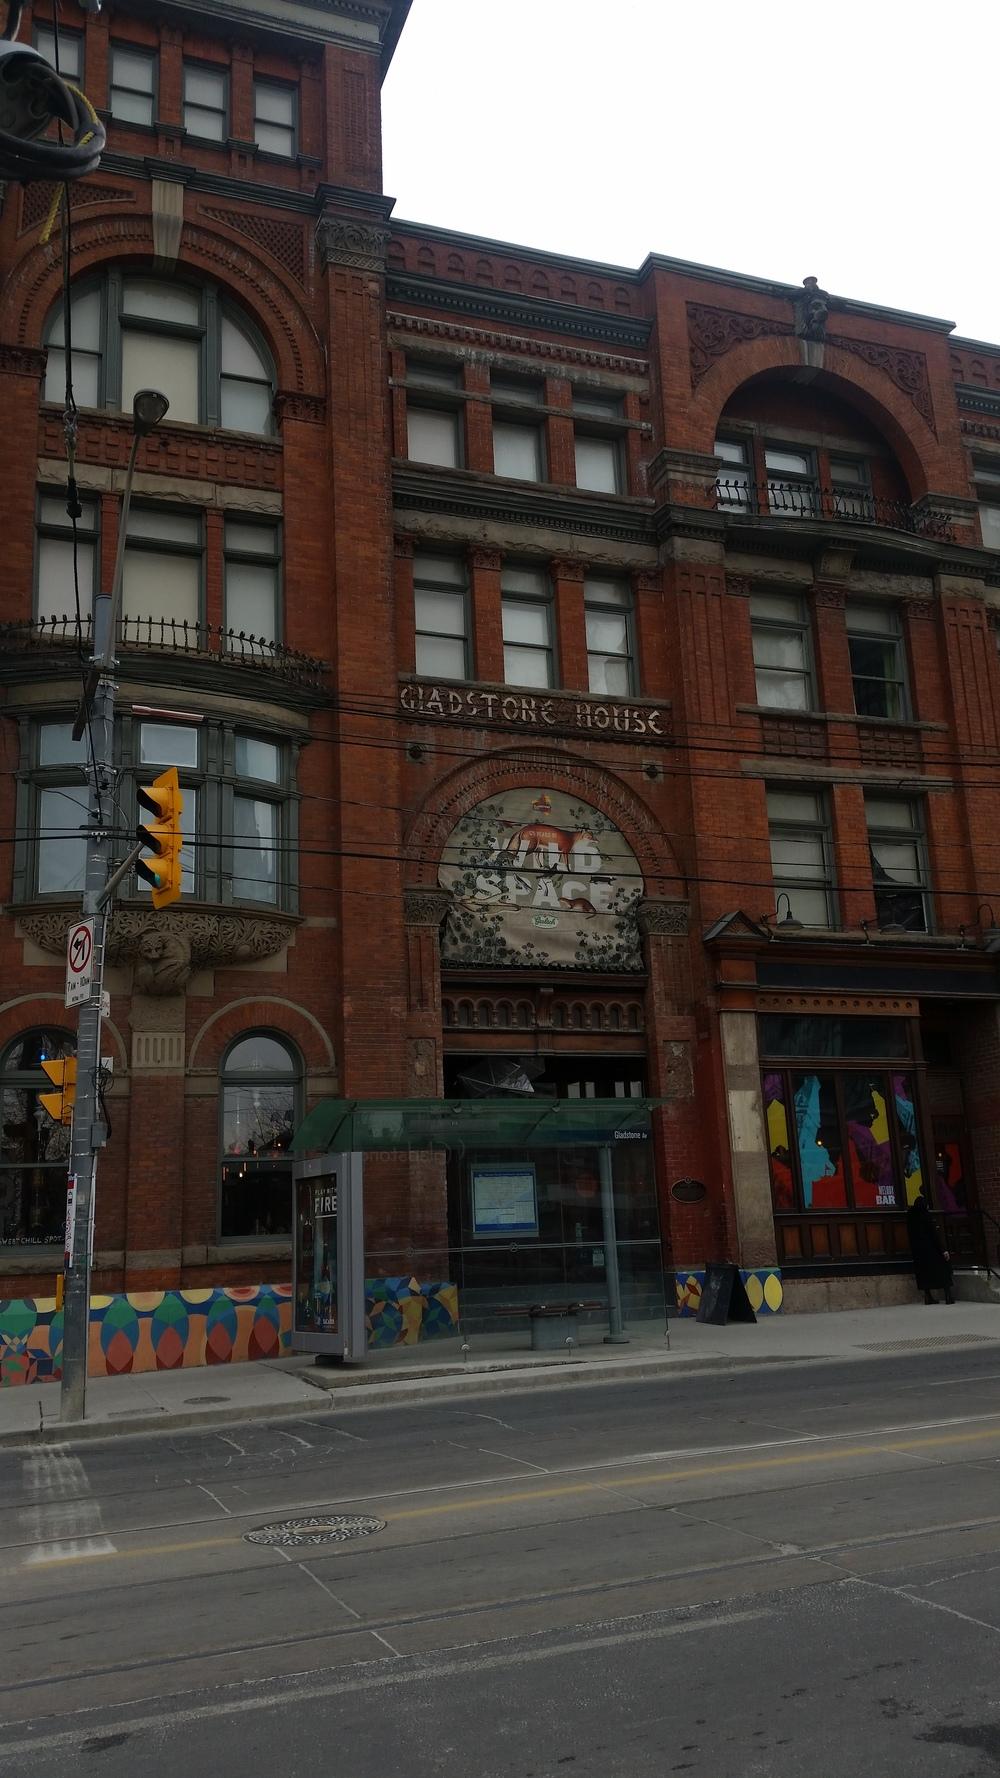 The historic Gladstone Hotel